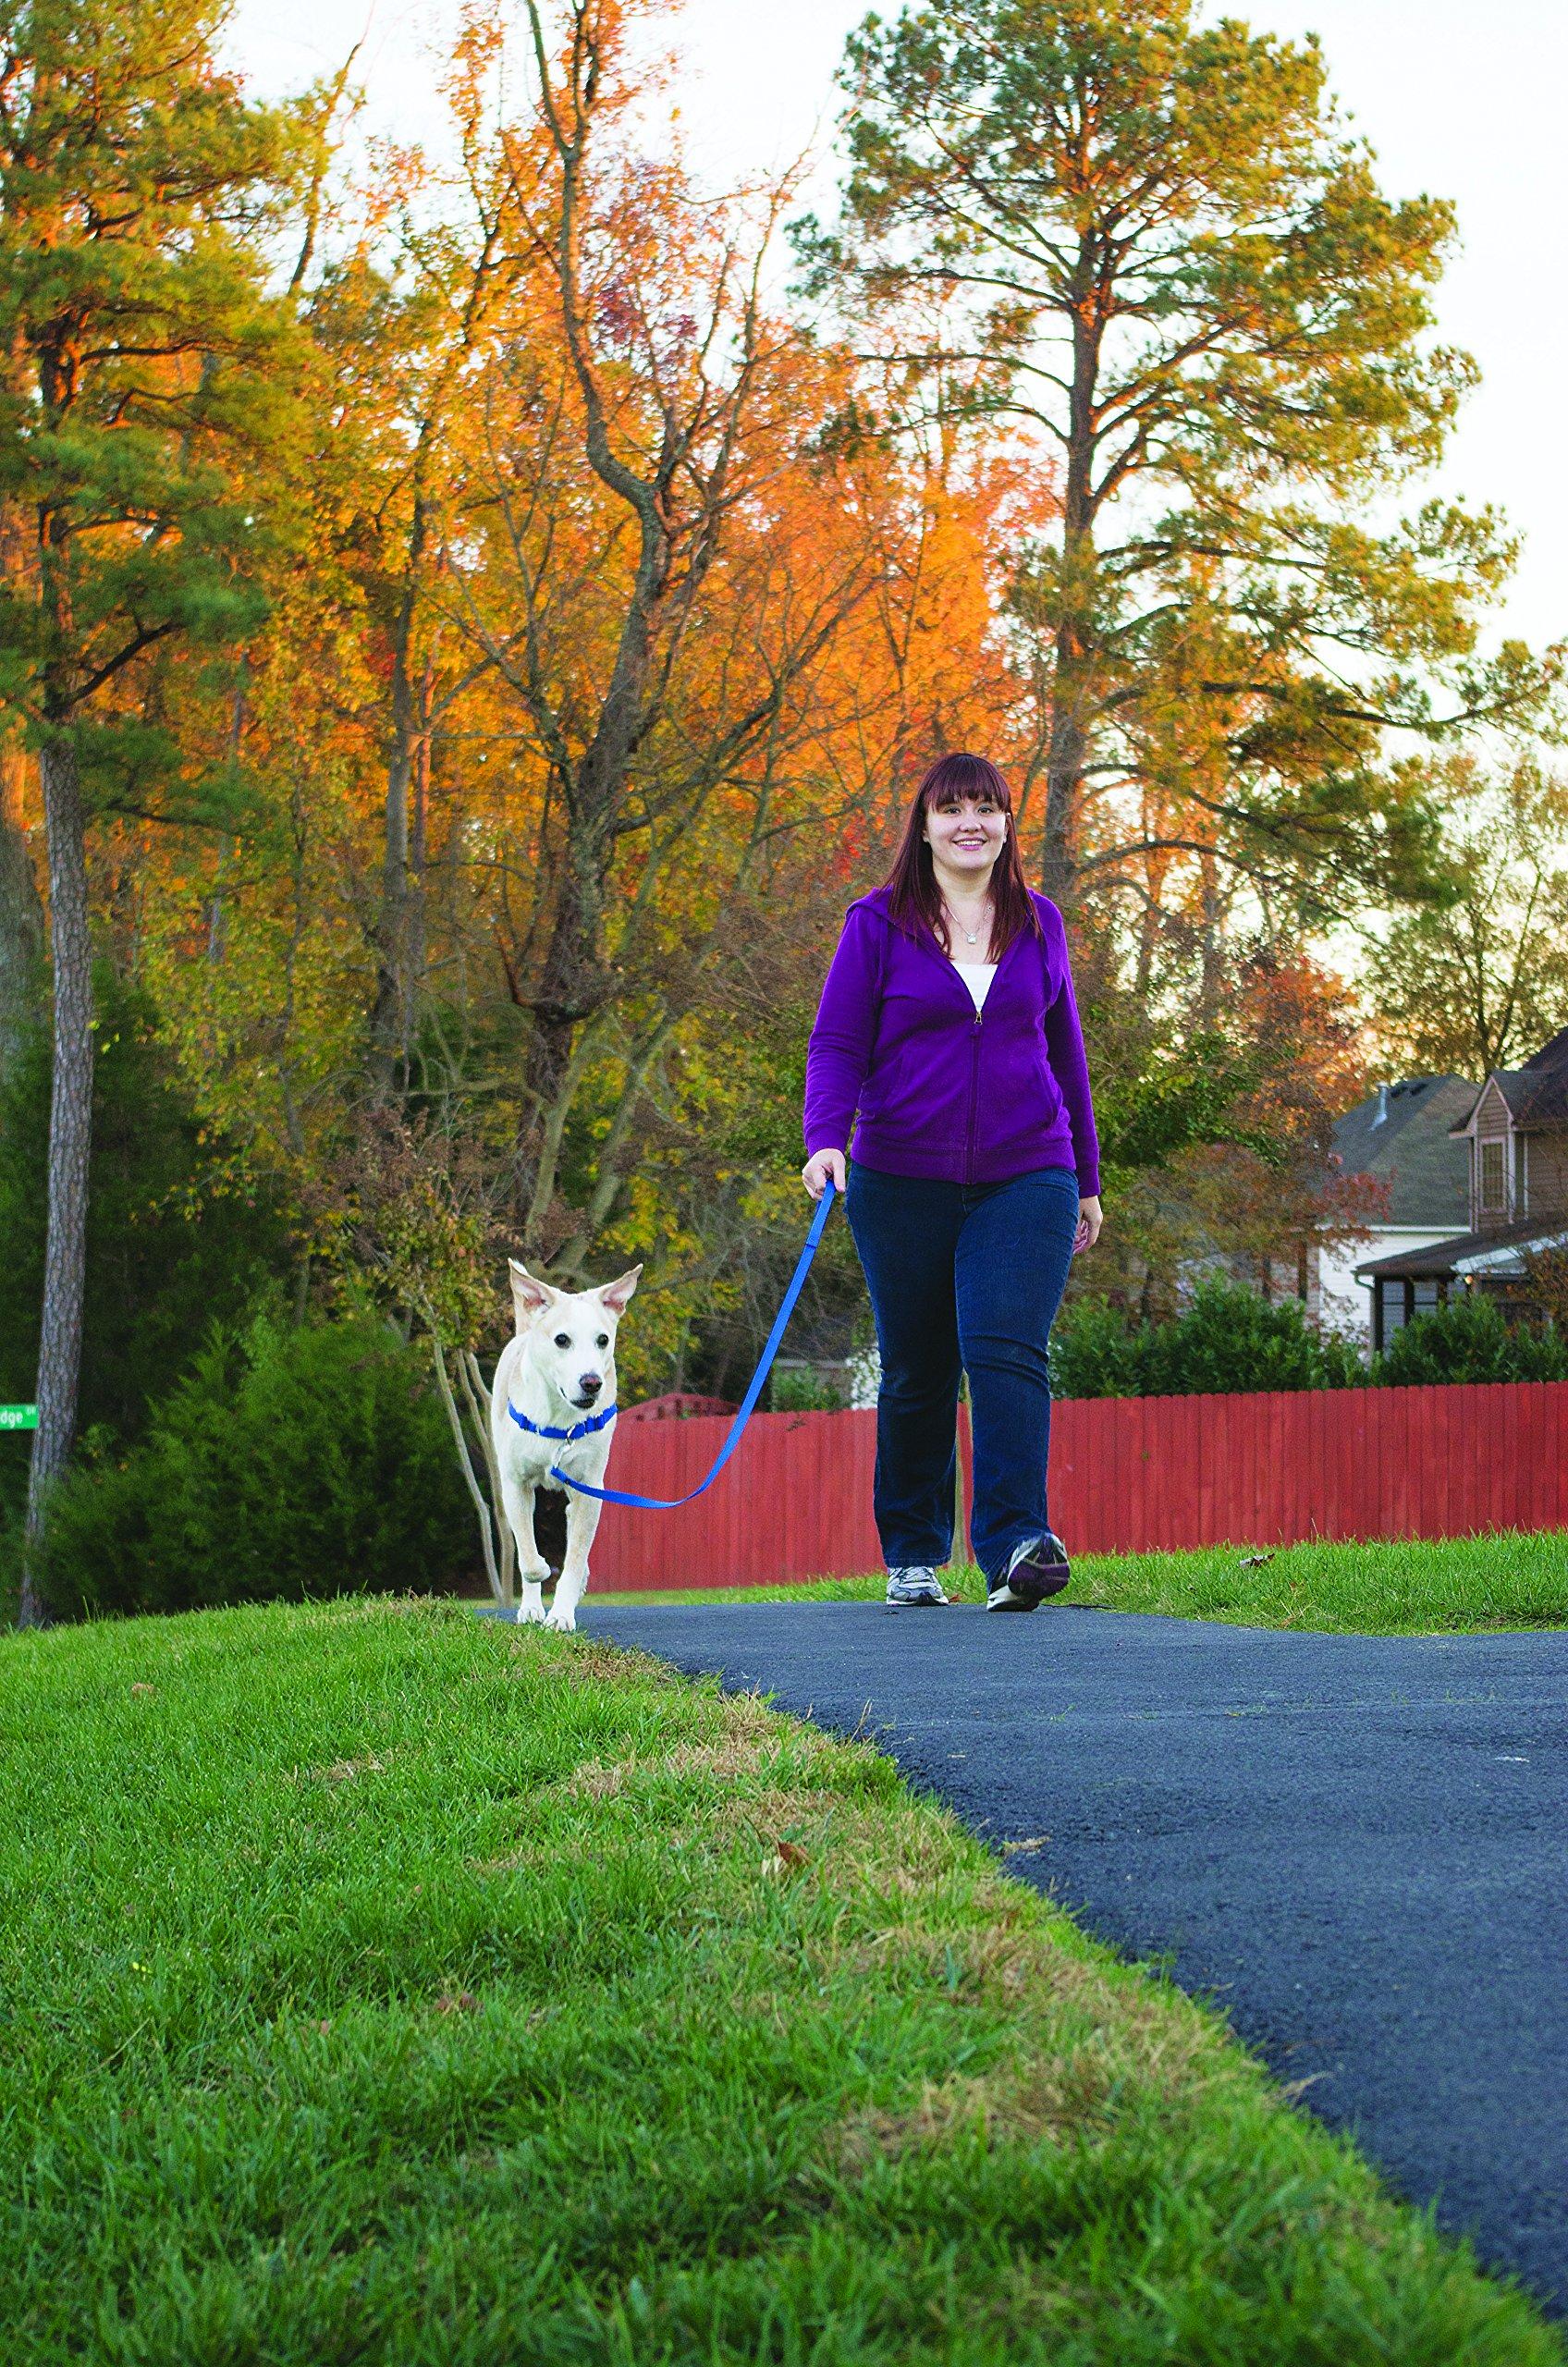 PetSafe Easy Walk Harness, Medium/Large, BLACK/SILVER for Dogs by PetSafe (Image #6)